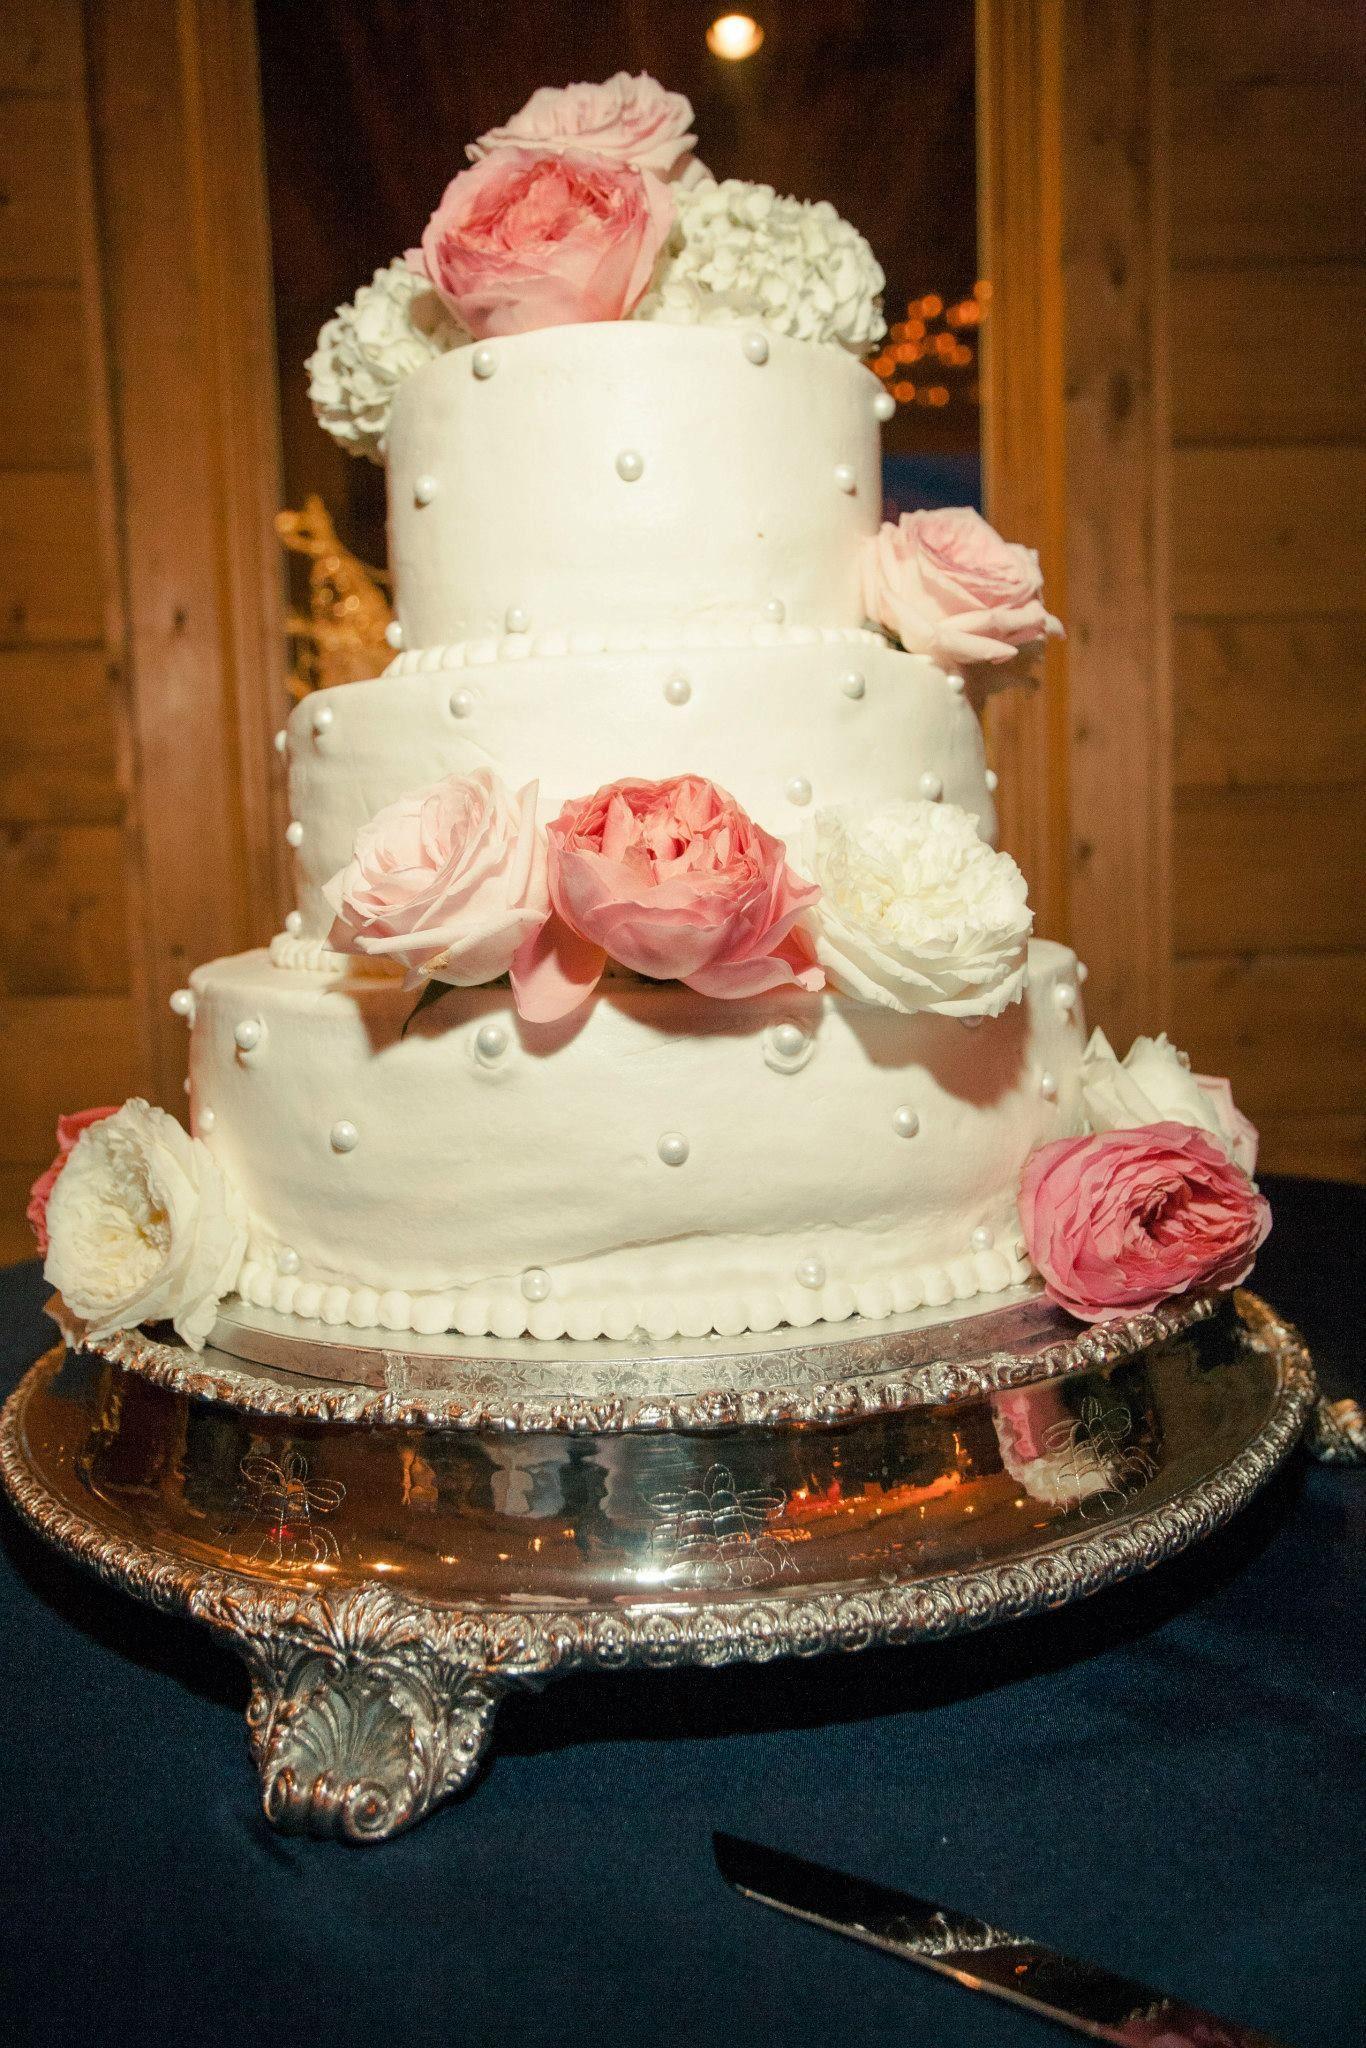 Wedding cake garden roses cabbage roses old english roses